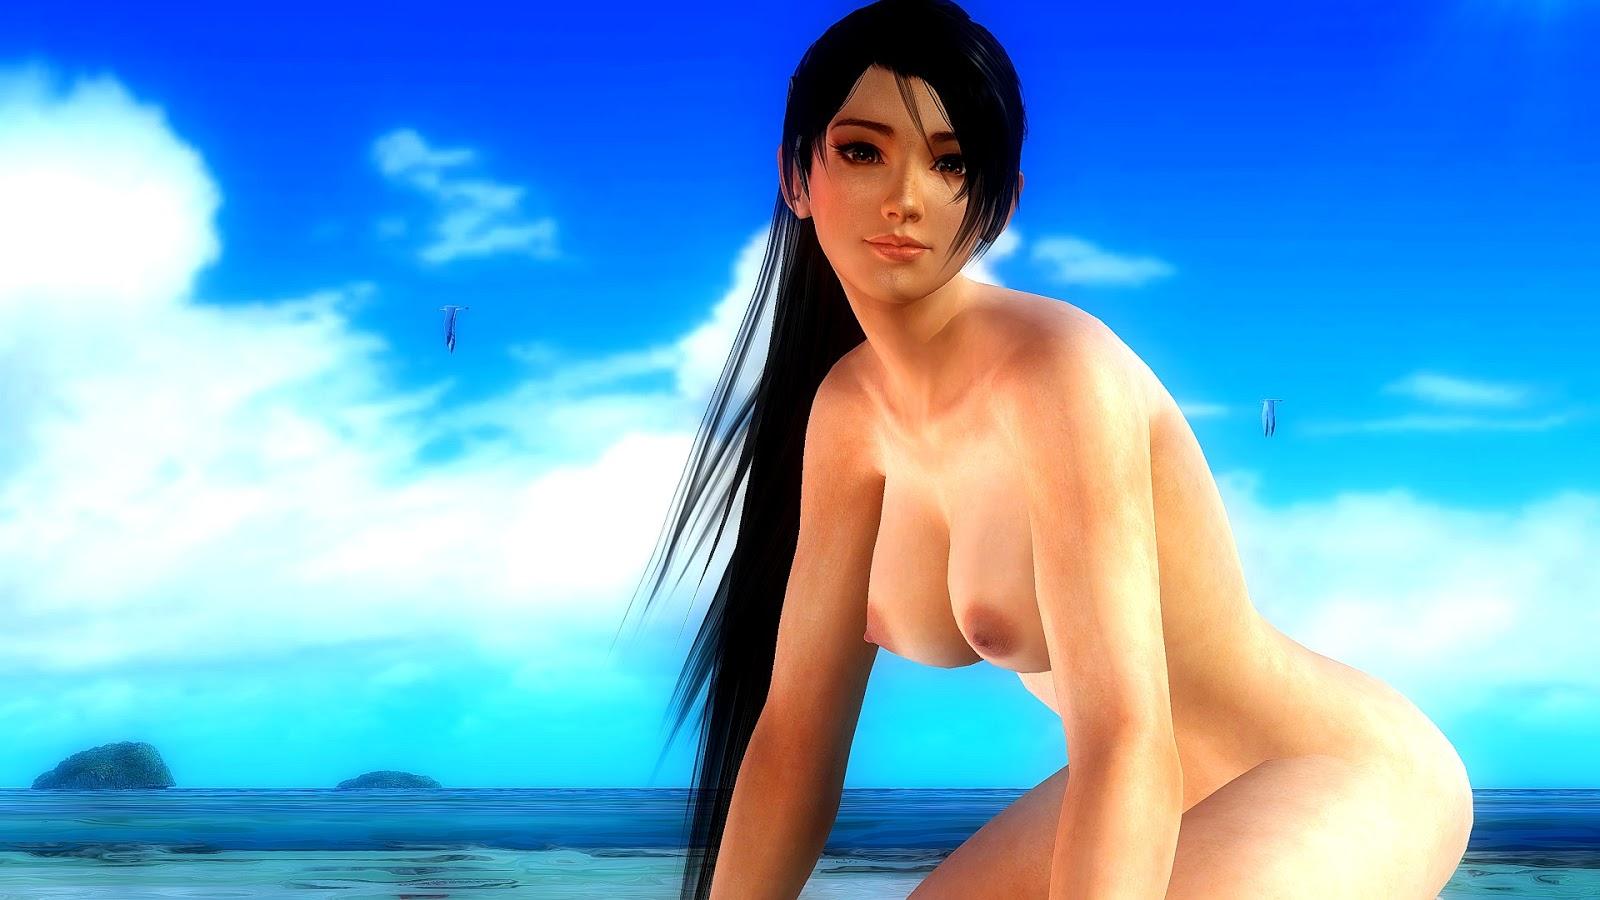 doa5lr nude